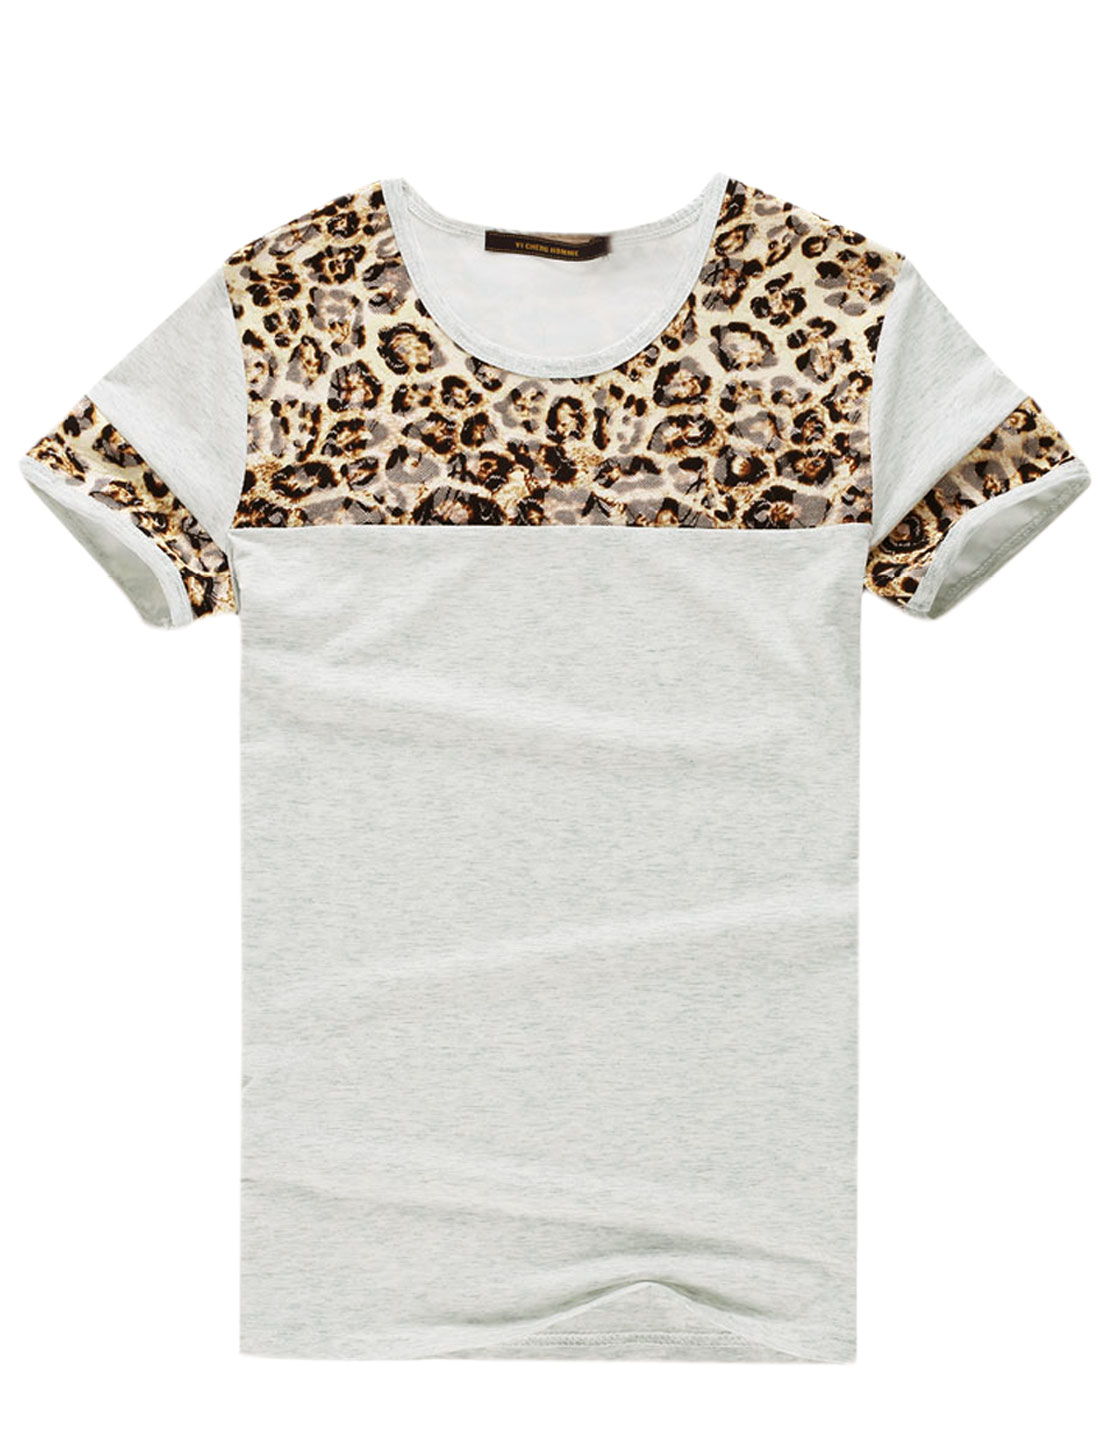 Men Short Sleeve Leopard Print Leisure T-Shirts Light Gray Beige M